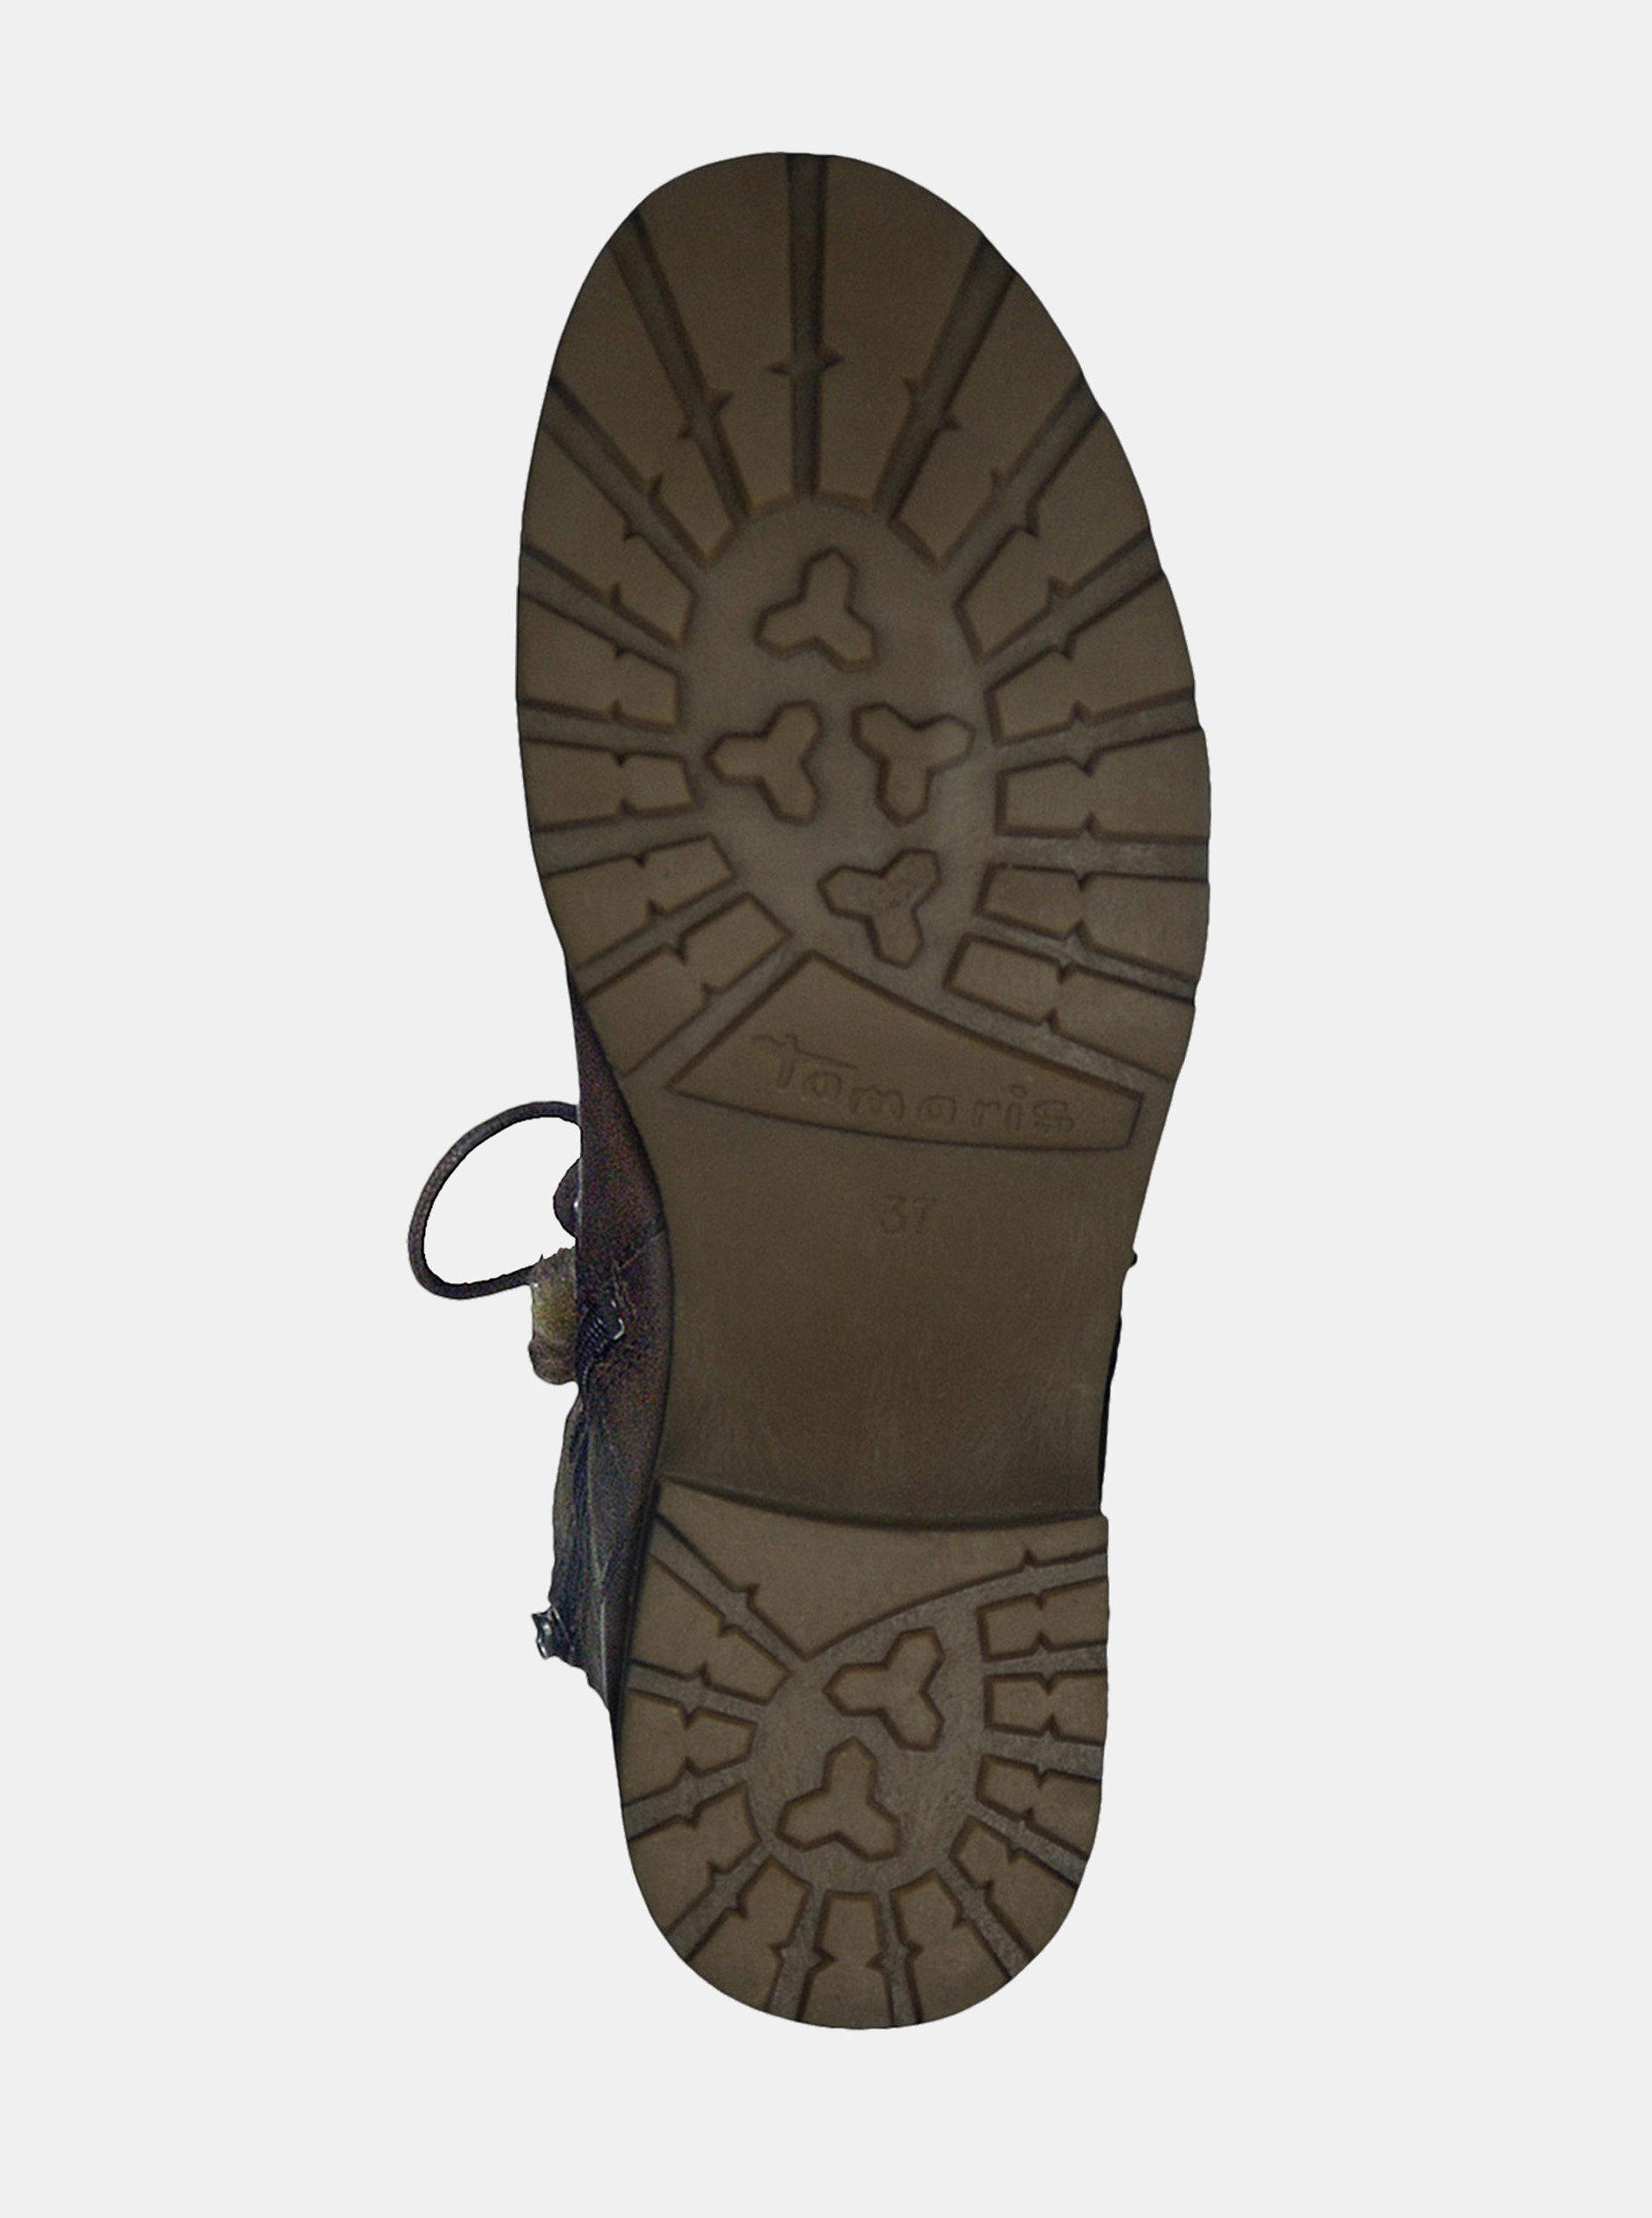 50495cb75 Tmavohnedé kožené členkové topánky so zateplenou podšívkou Tamaris ...